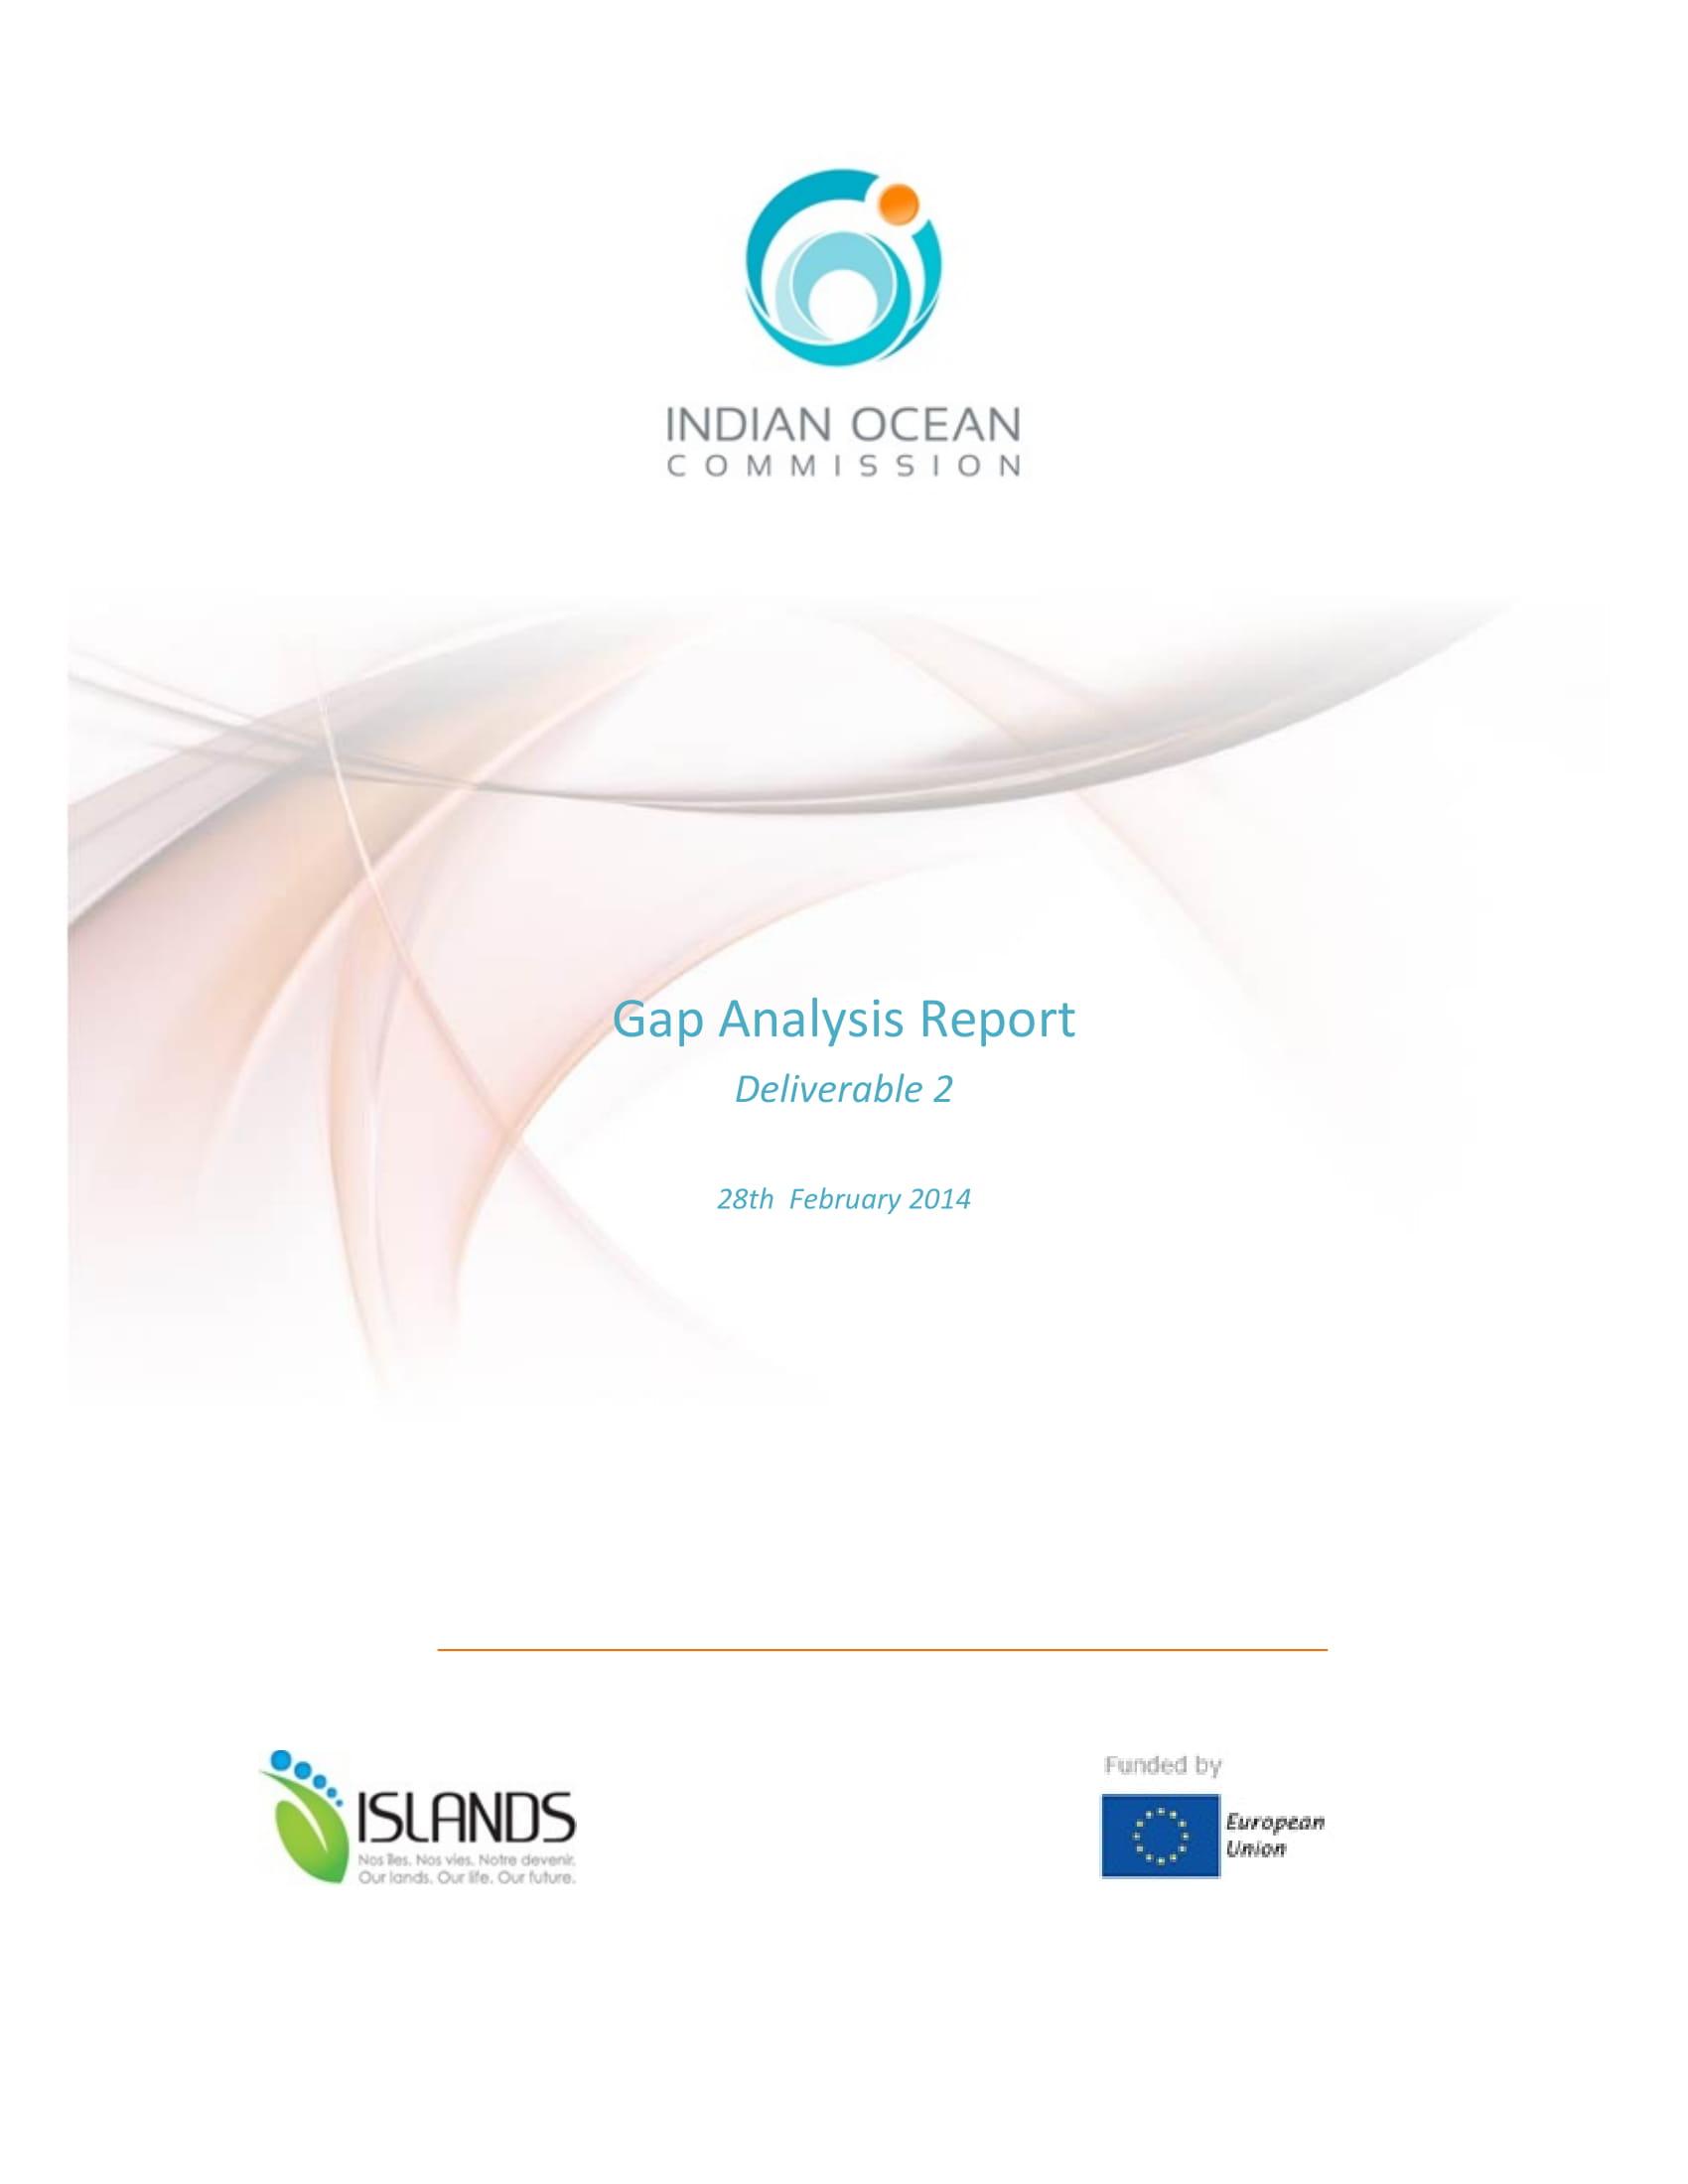 gap analysis report development guide example 01